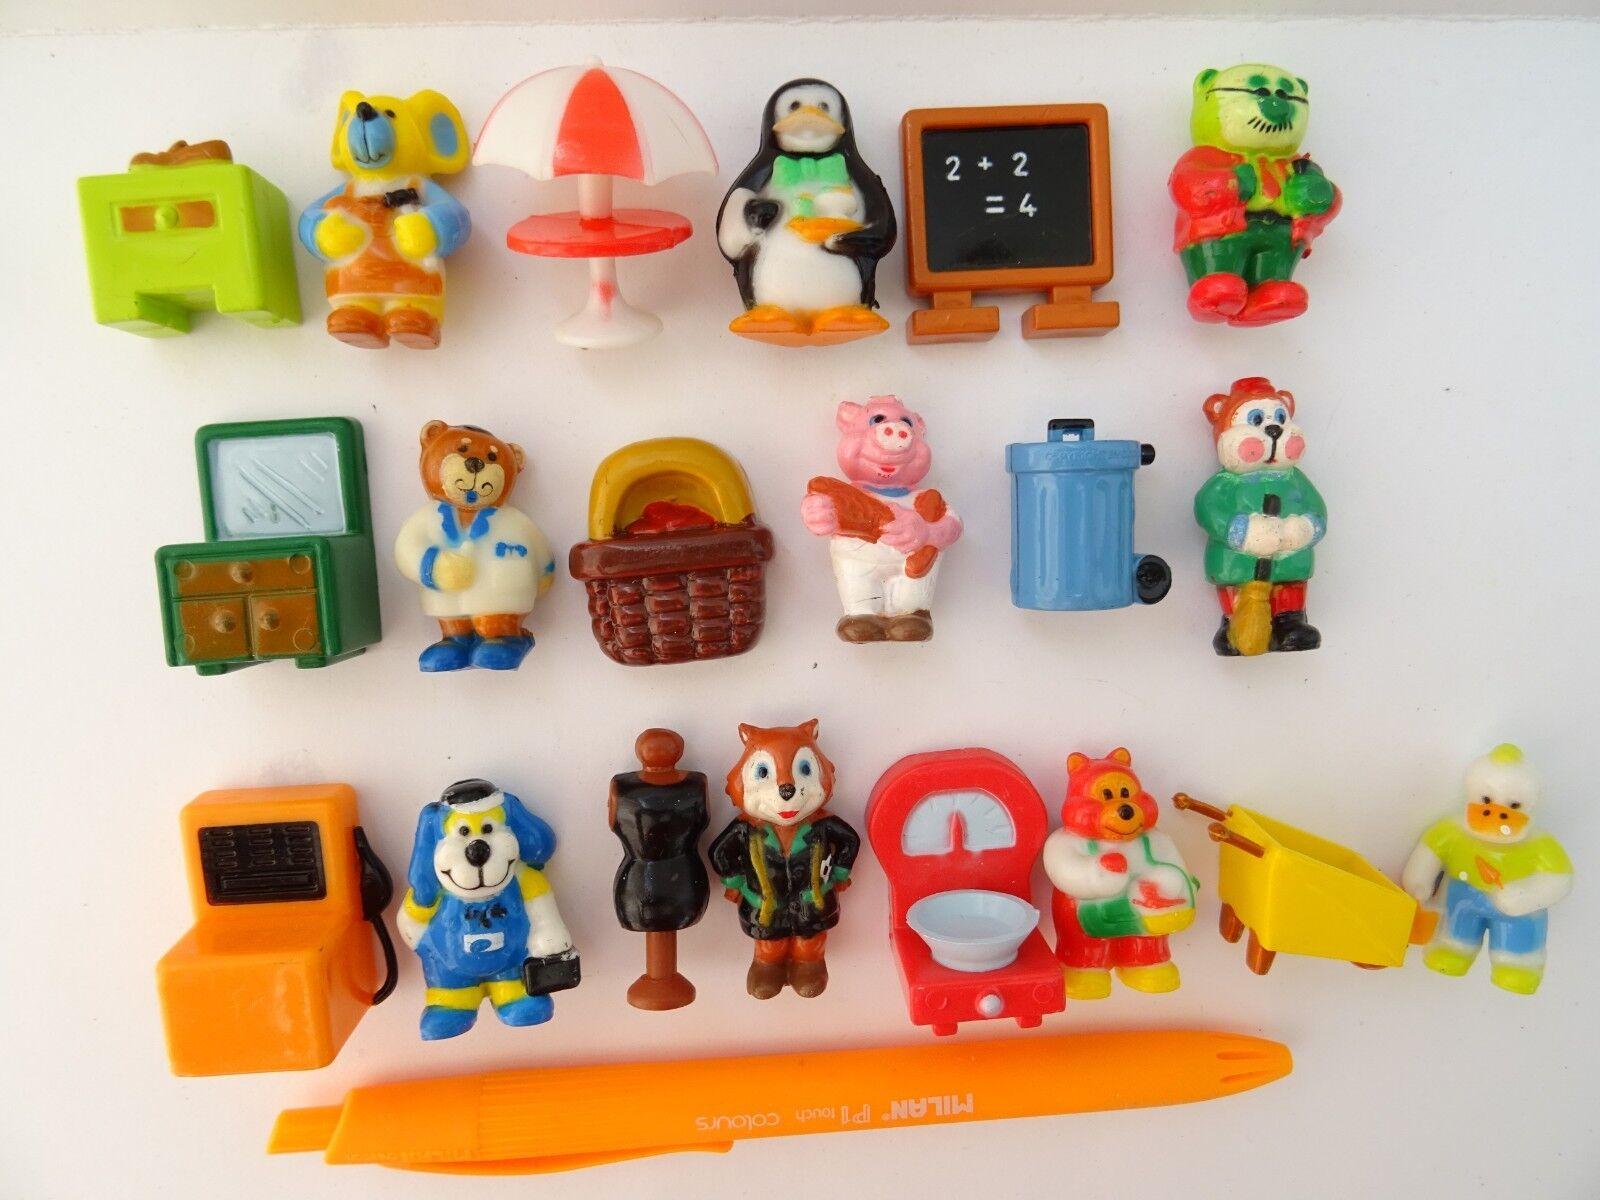 Collectible Complete 20 Figures Set CIOCORI Cercaffetto Nestle Motta 1991 1992